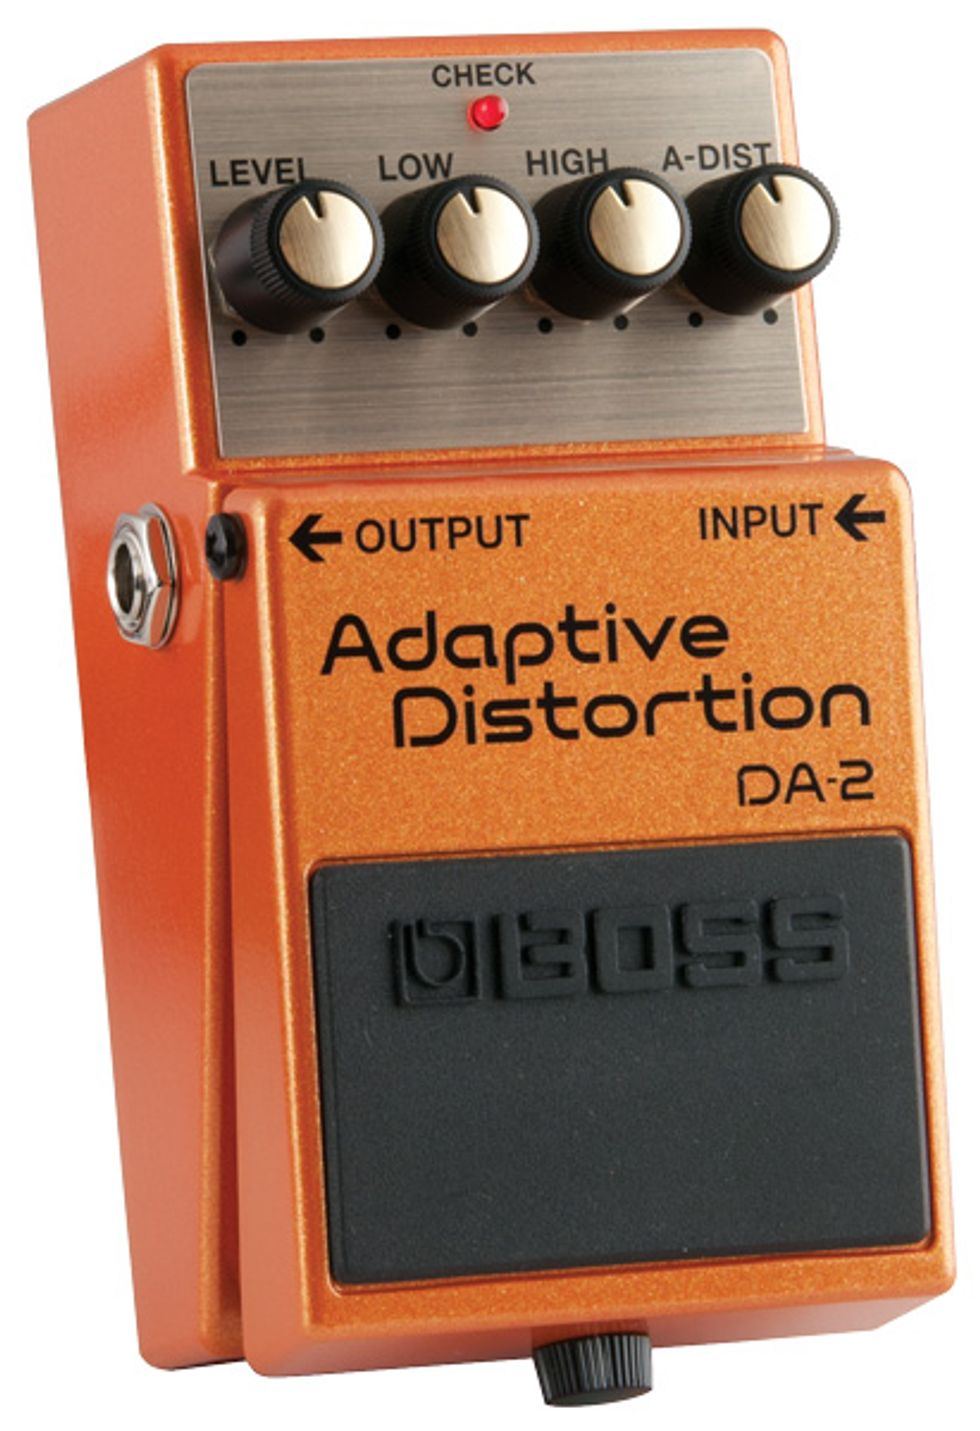 boss da 2 adaptive distortion review 2013 08 29 premier guitar. Black Bedroom Furniture Sets. Home Design Ideas